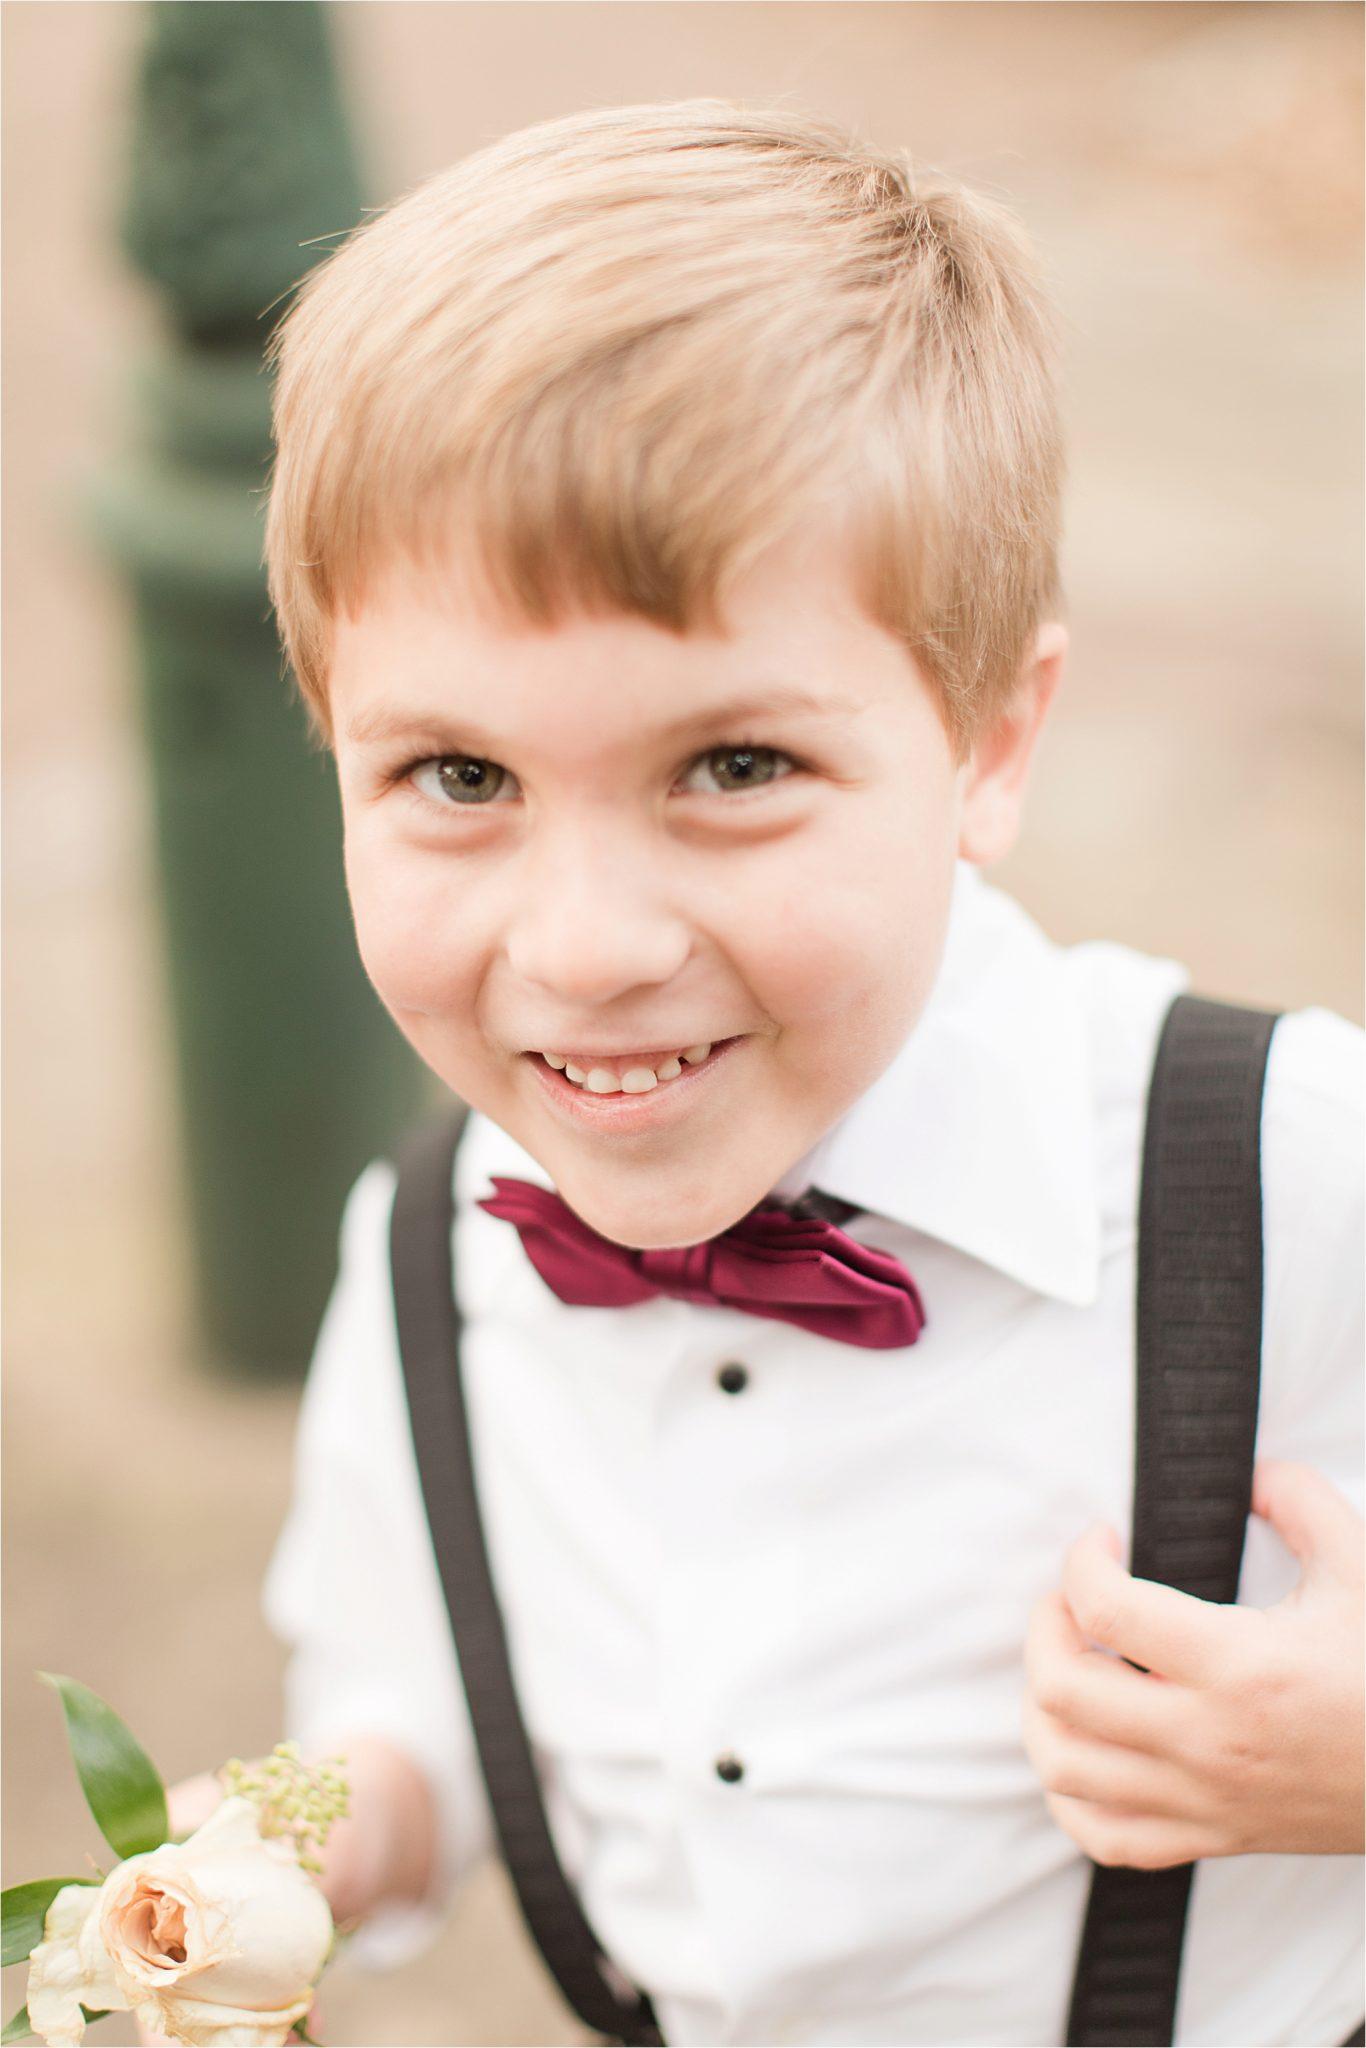 ring-bearer-maroon-bow-tie-suspenders-alabama-wedding-photographer